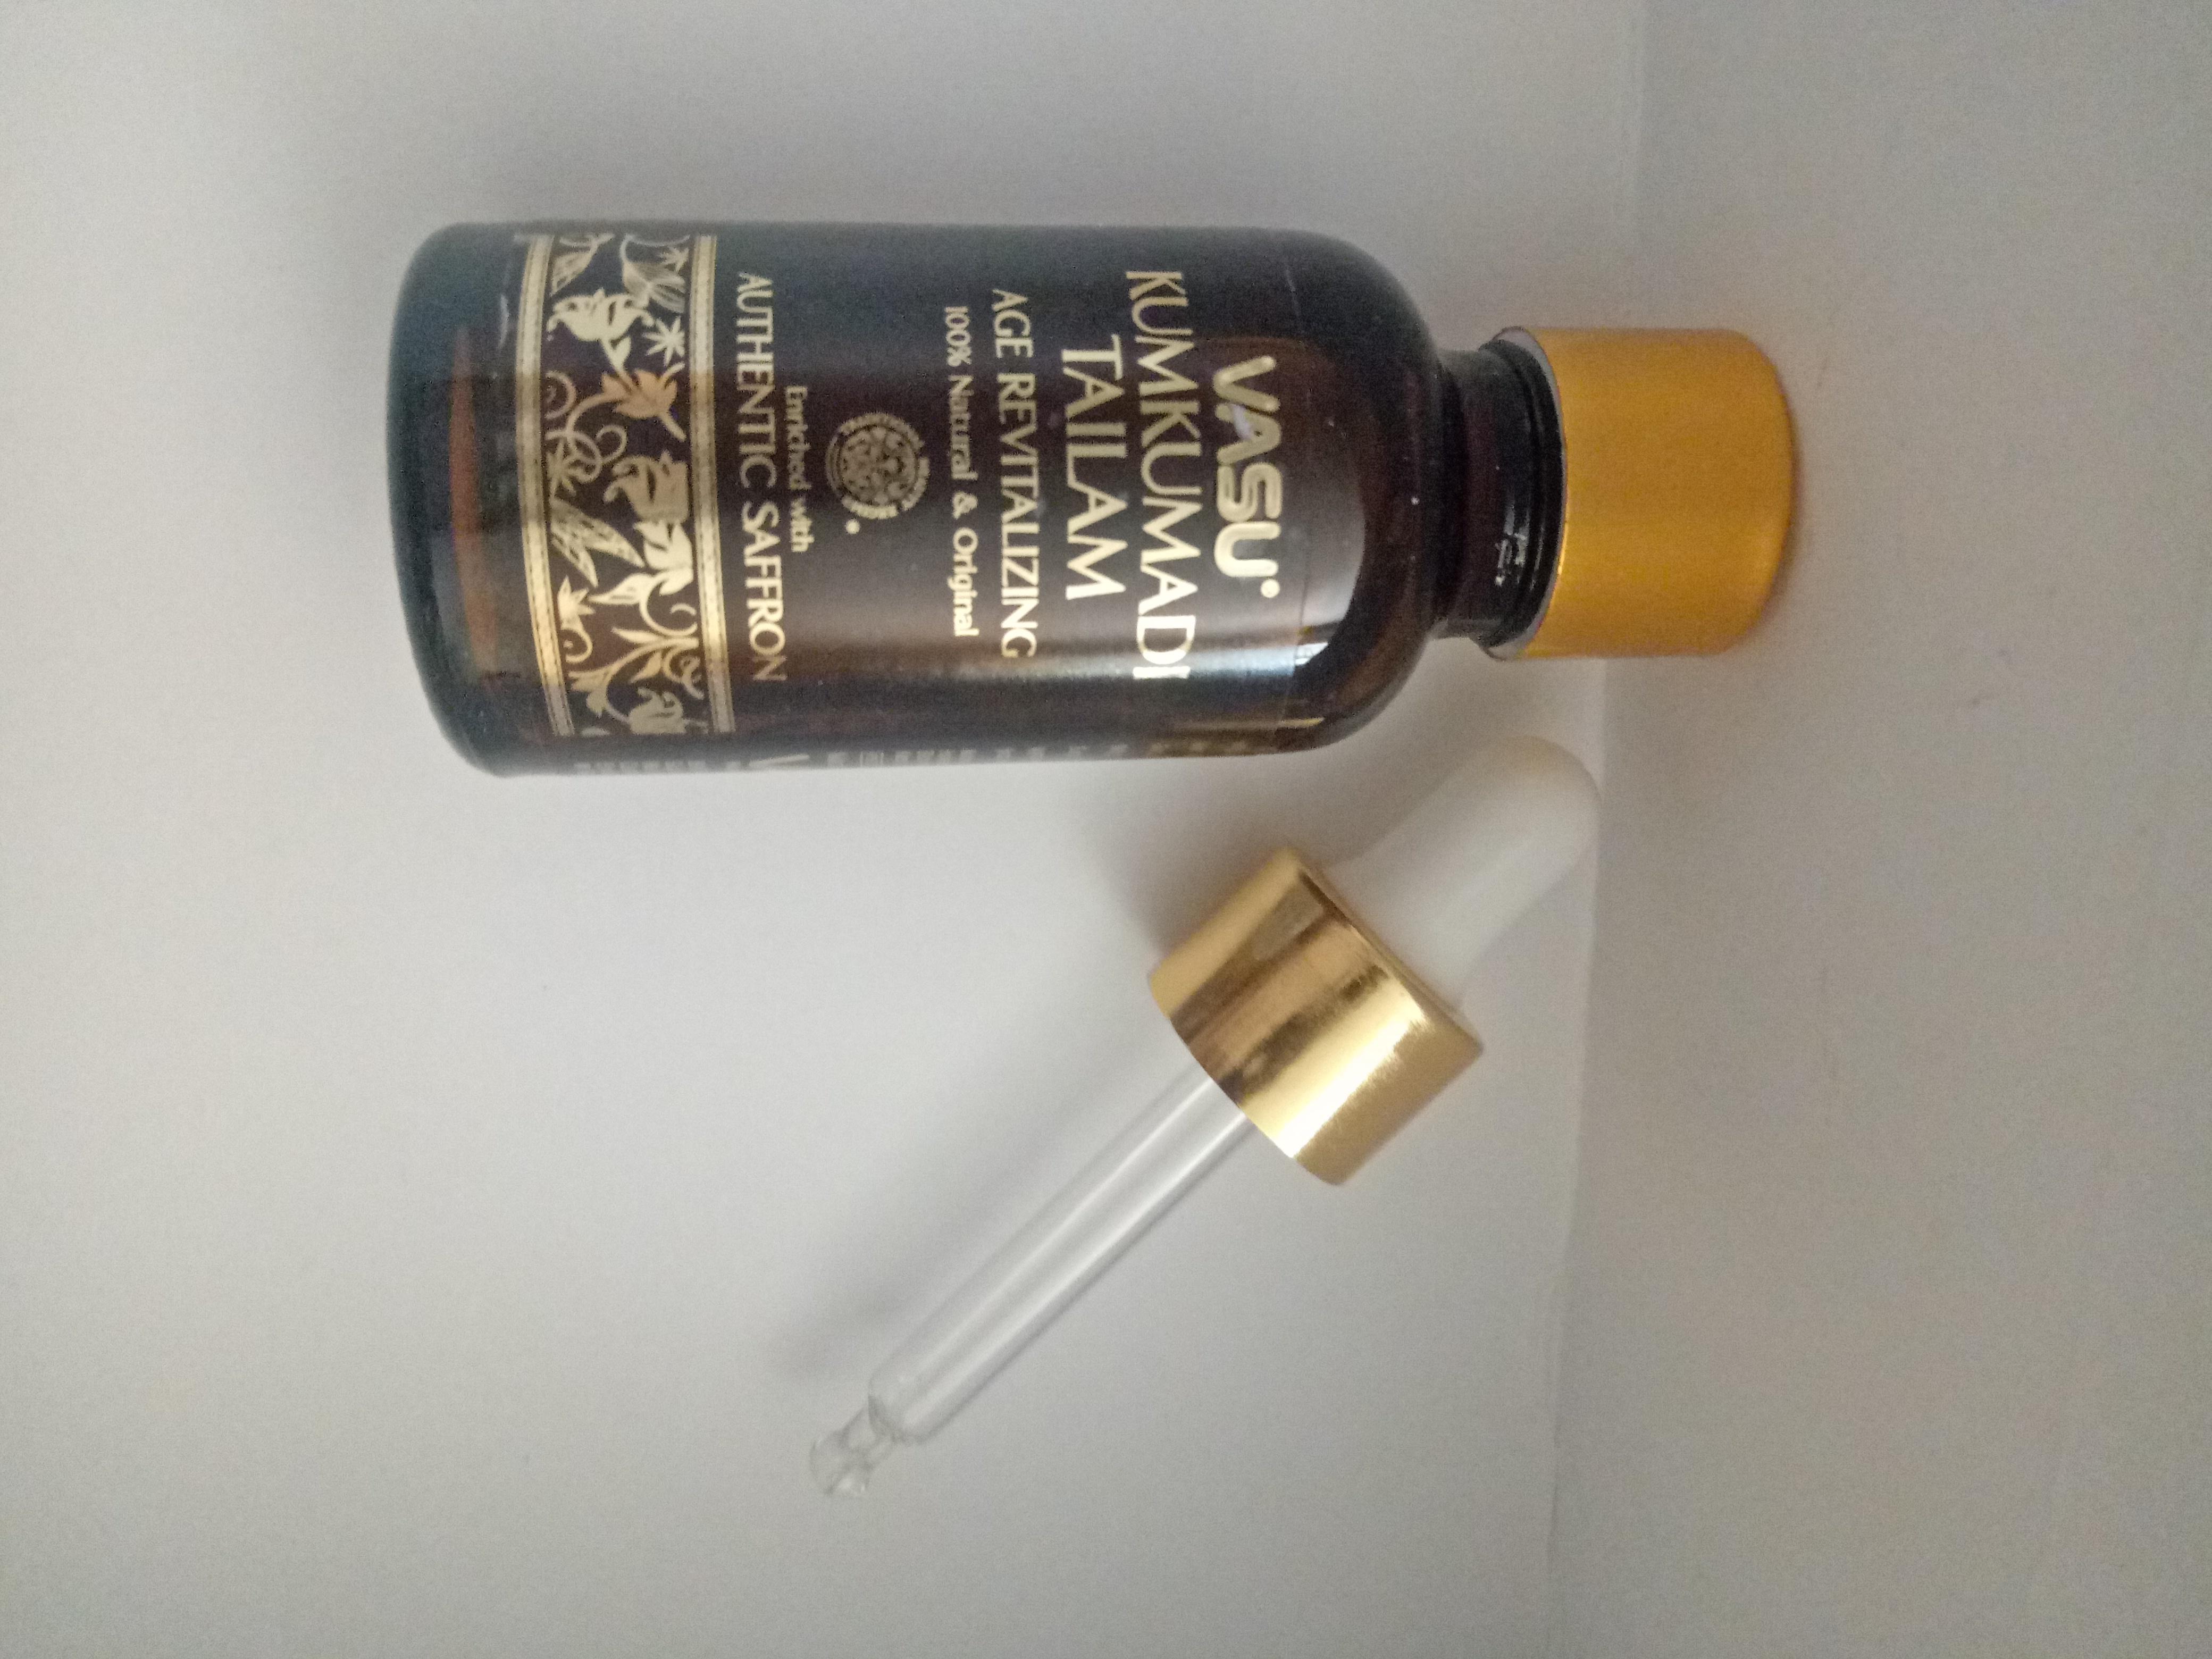 Vasu Age Revitalizing Kumkumadi Tailam-The fragrance is love.-By swapnali